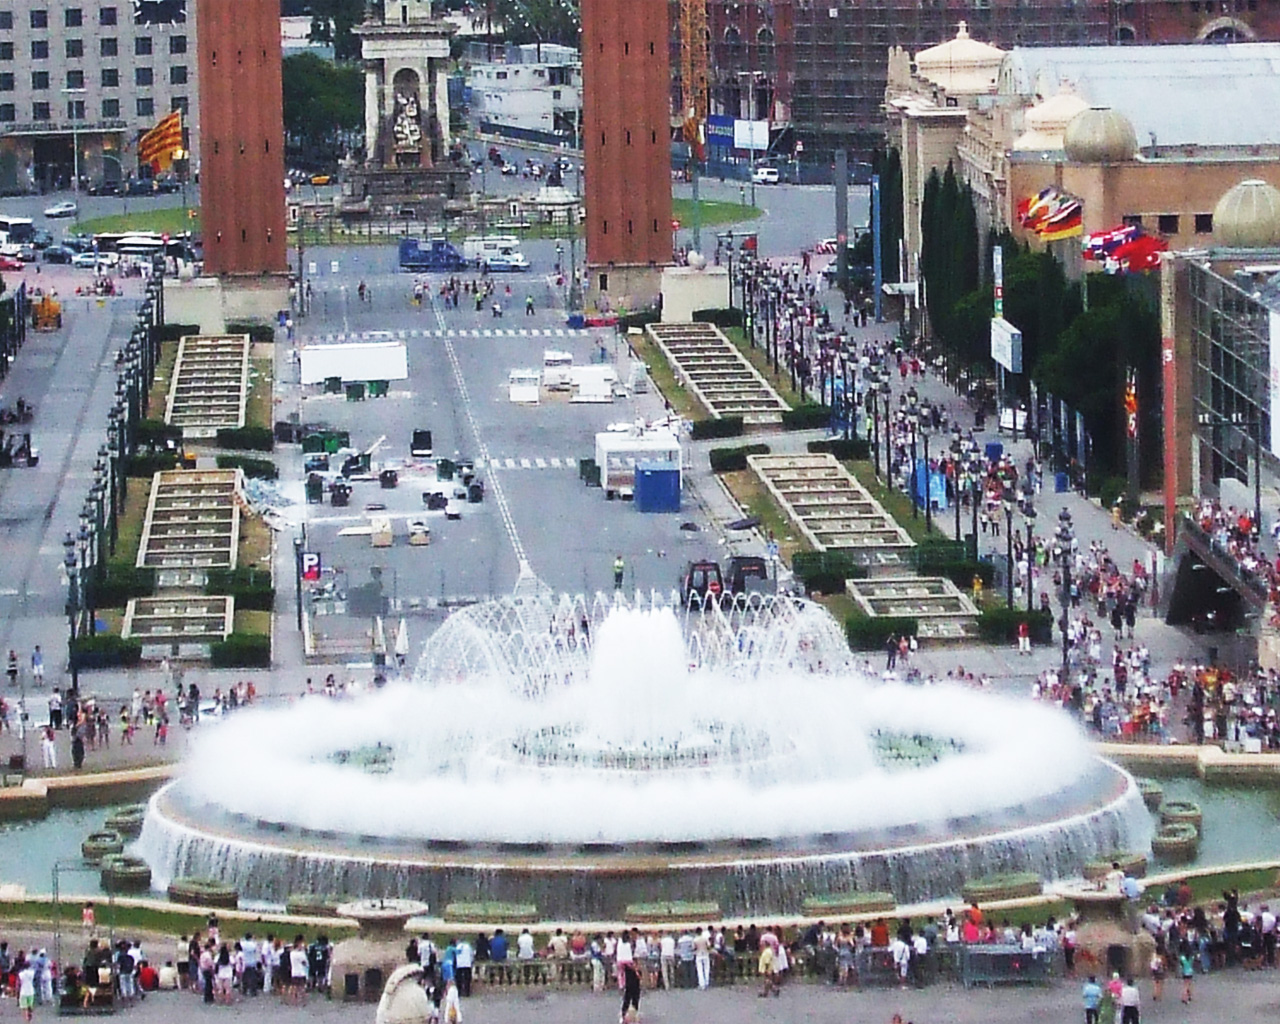 http://2.bp.blogspot.com/-MSGQjvRZjQc/T9Yljj2zjlI/AAAAAAAAARE/dIMJGFAtg18/s1600/Fountain-Barcelona-Wallpaper.jpg